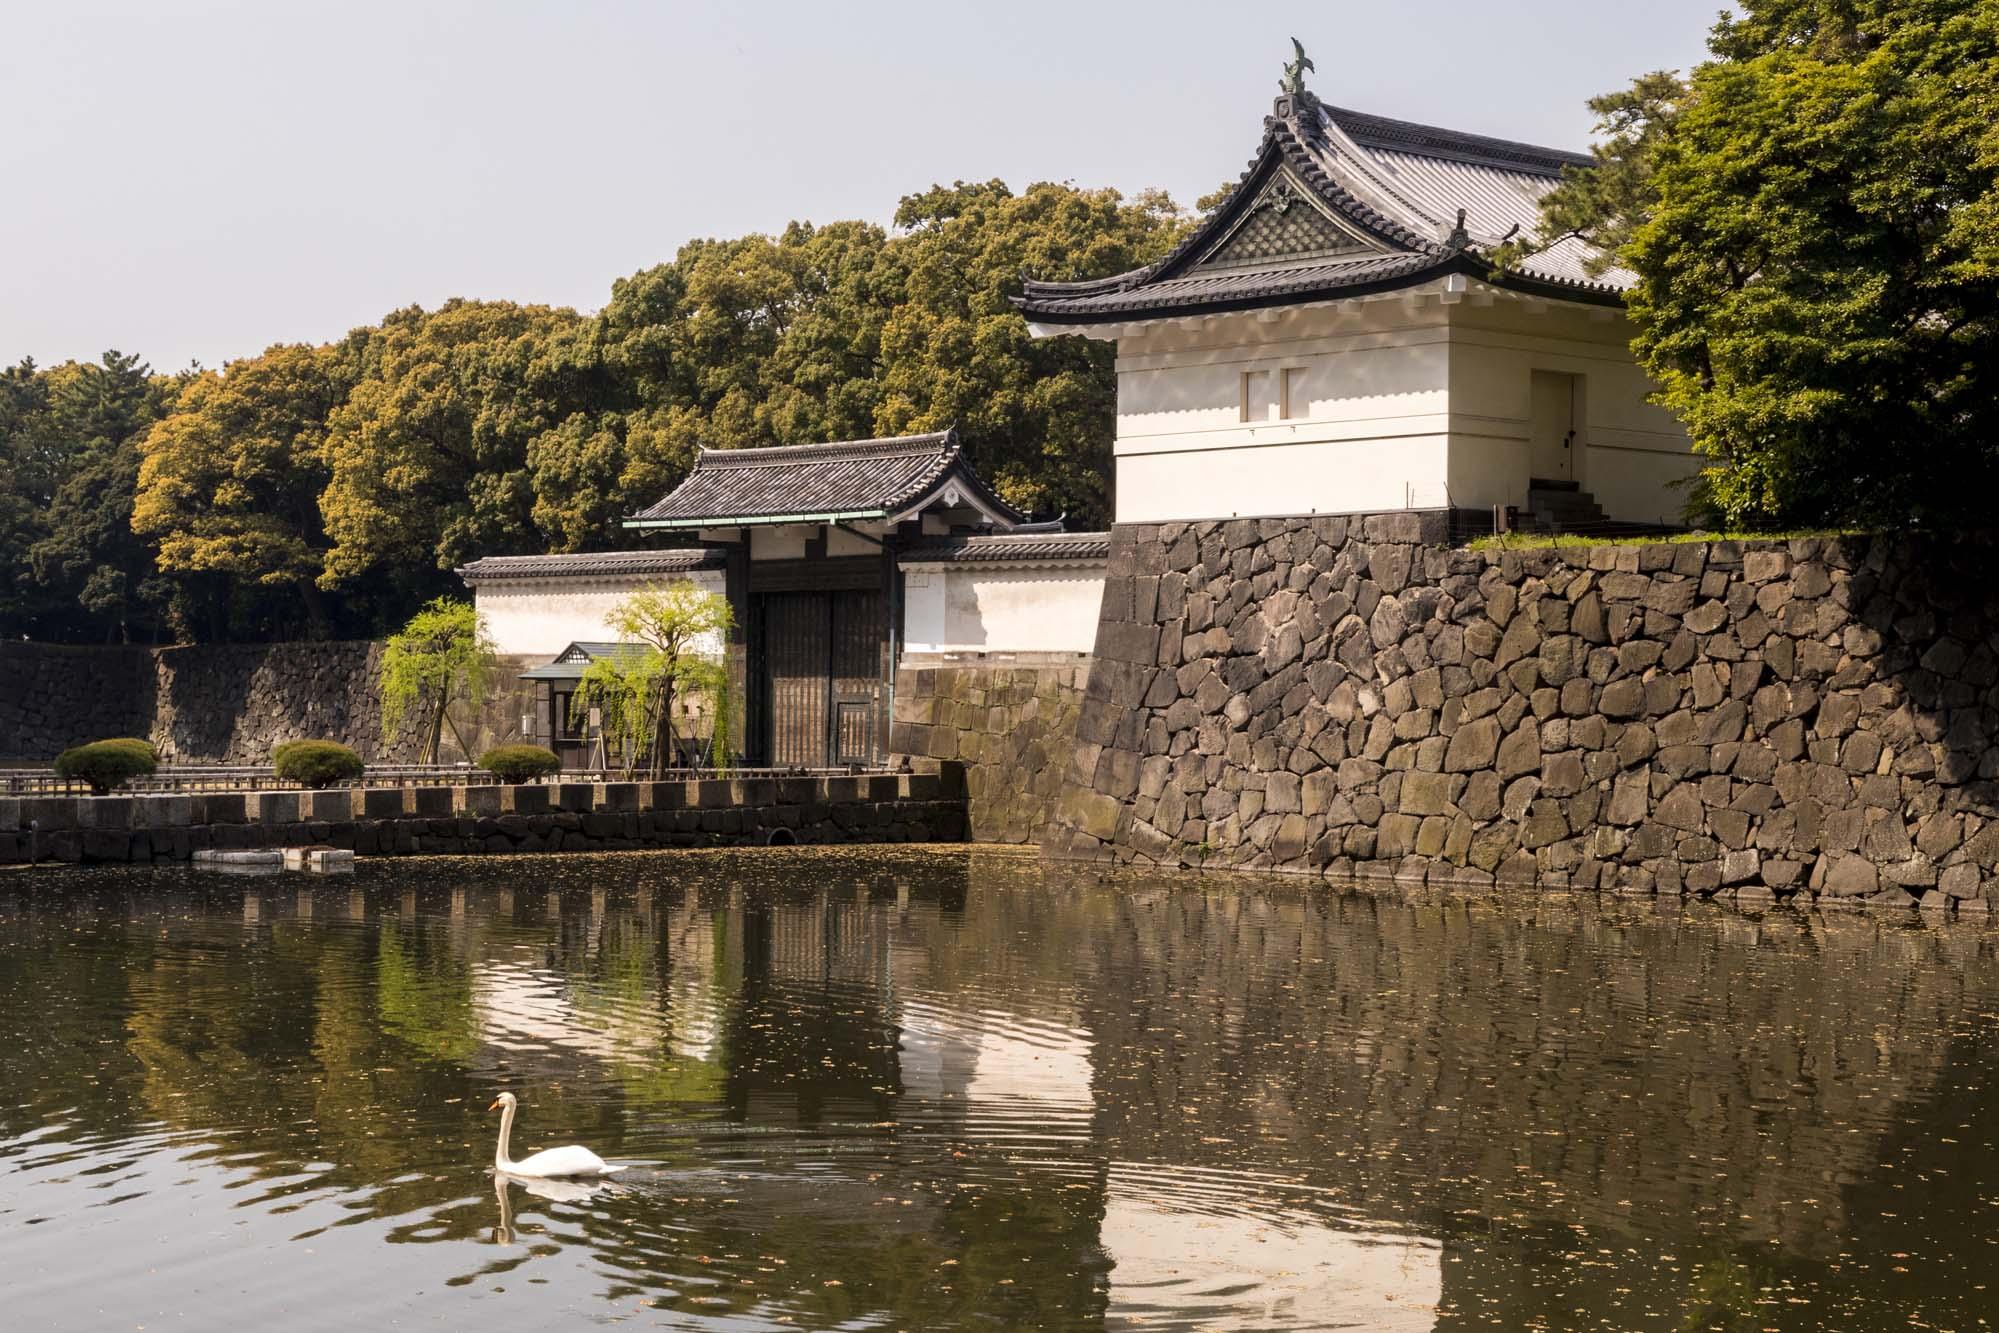 Kōkyo dans la ville de Tōkyō au Japon